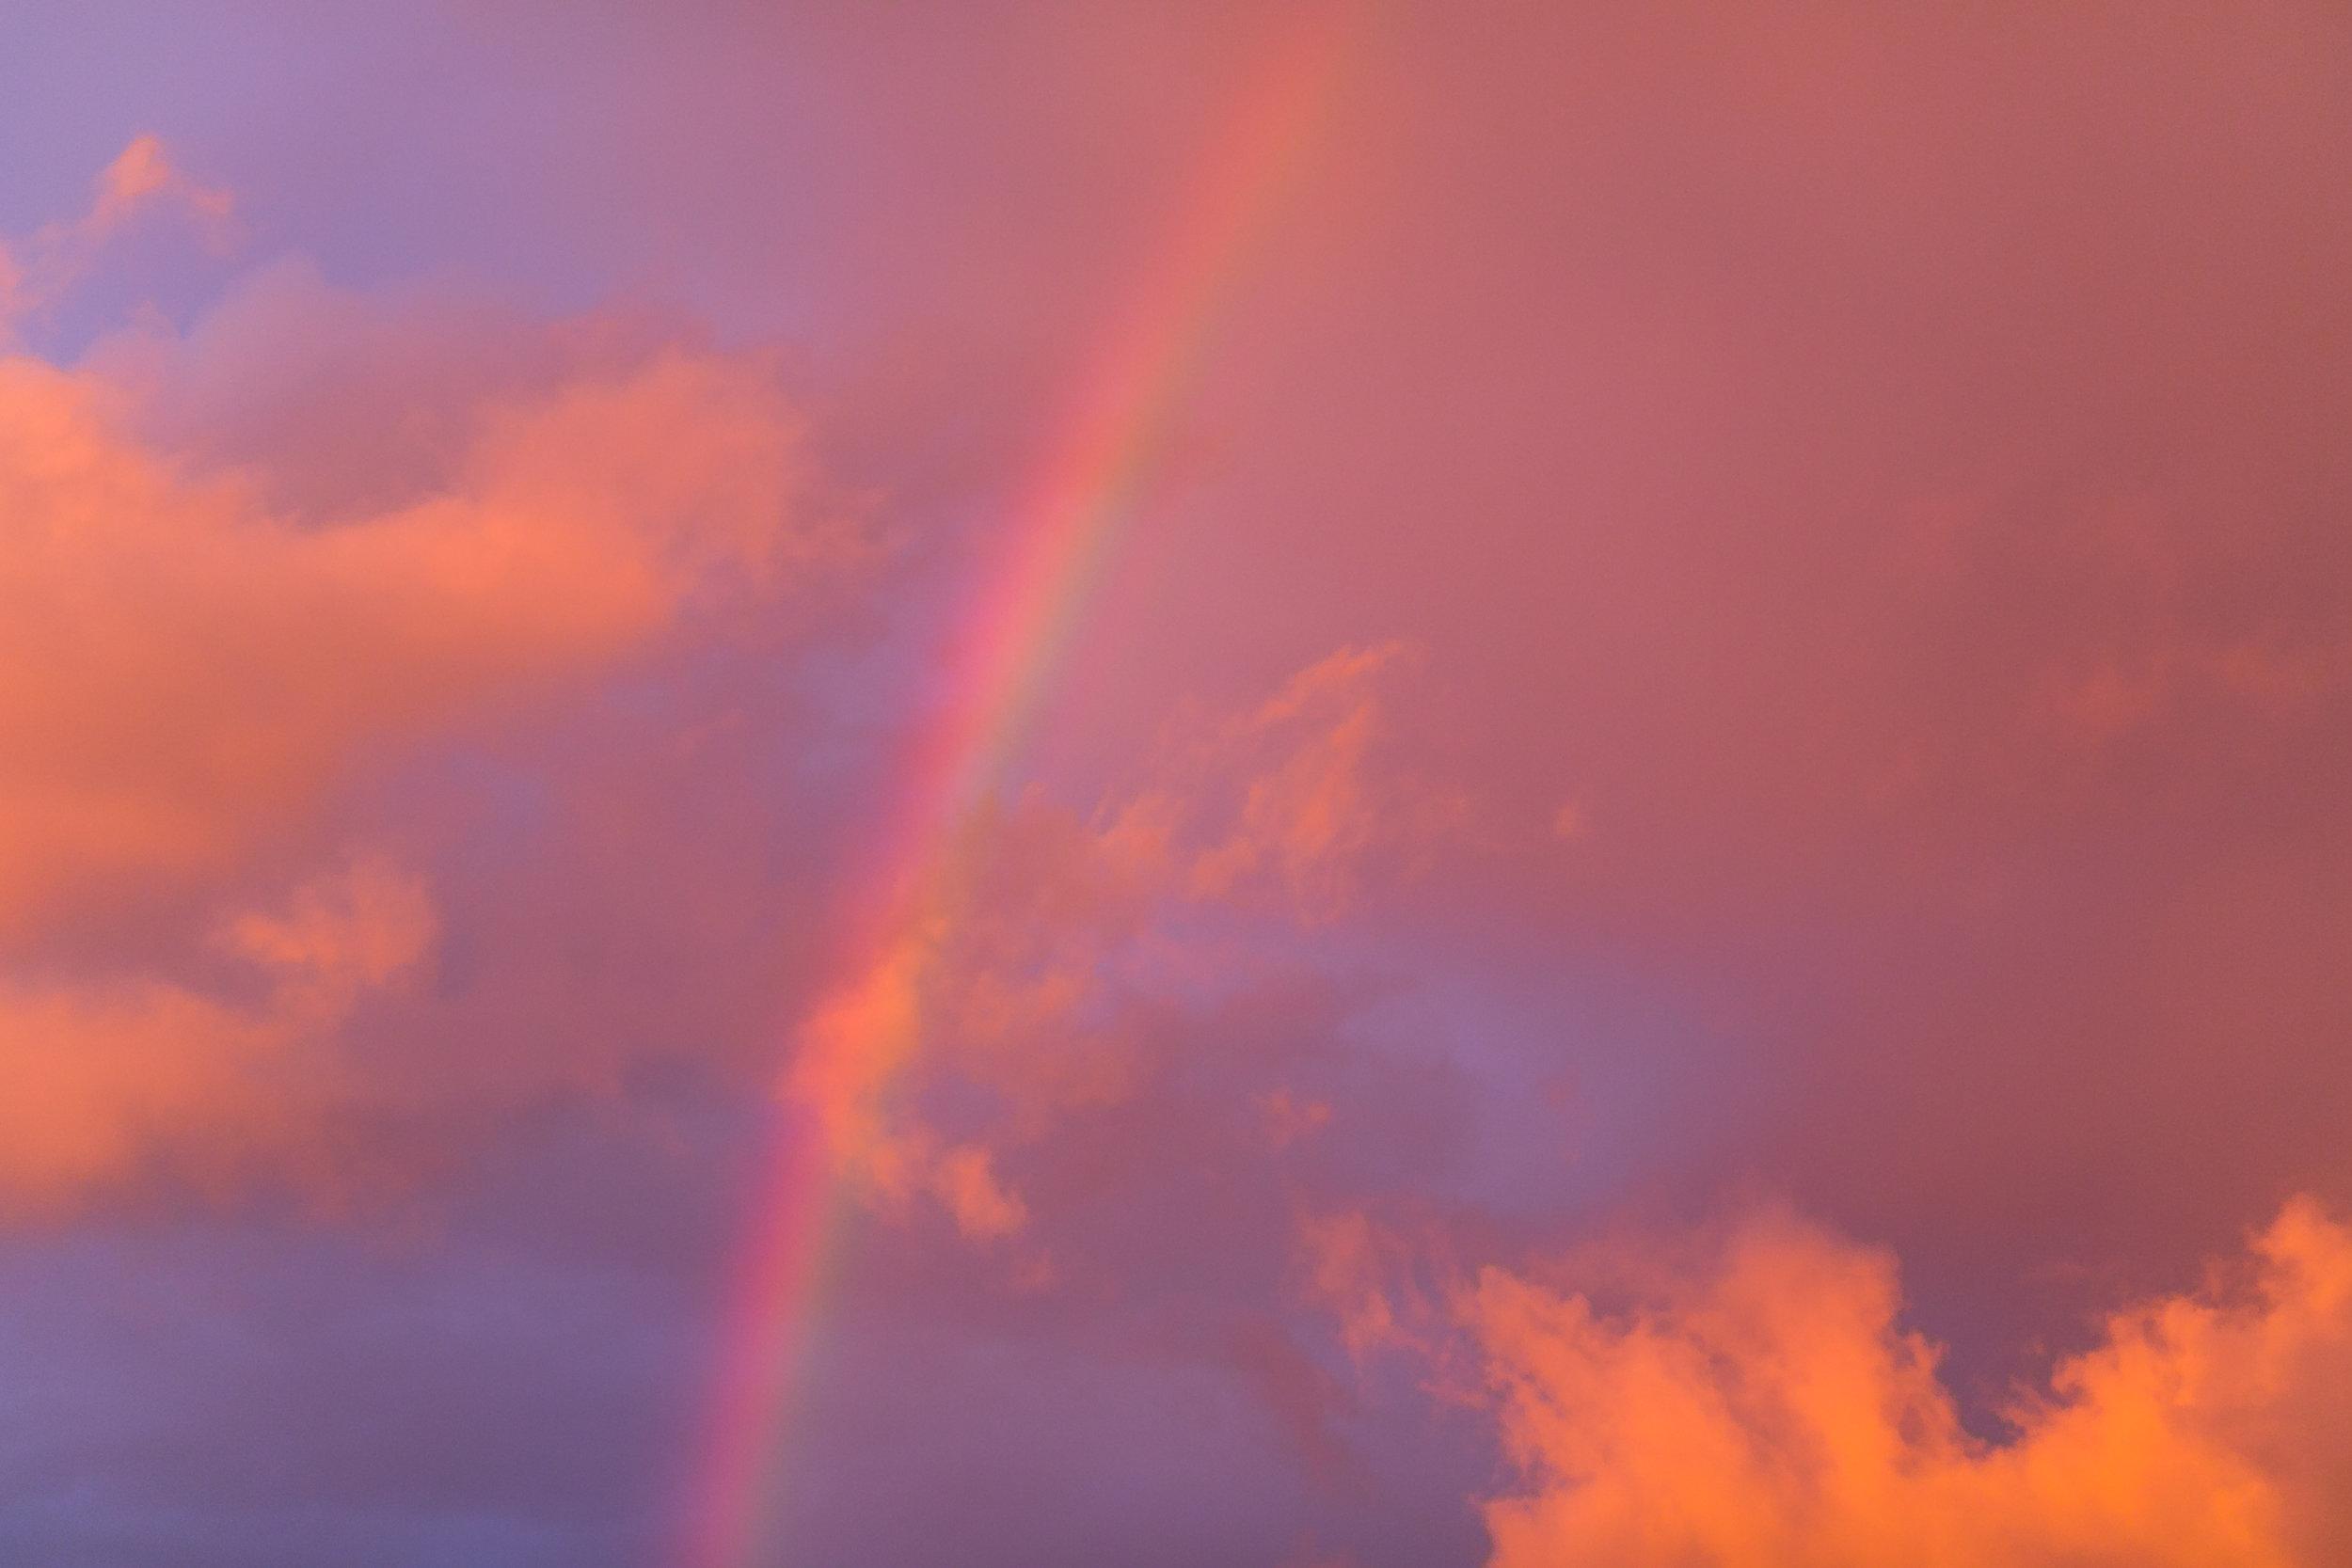 A beautiful rainbow sunset I took over 10 years ago now on Haida Gwaii. Seemed fitting.